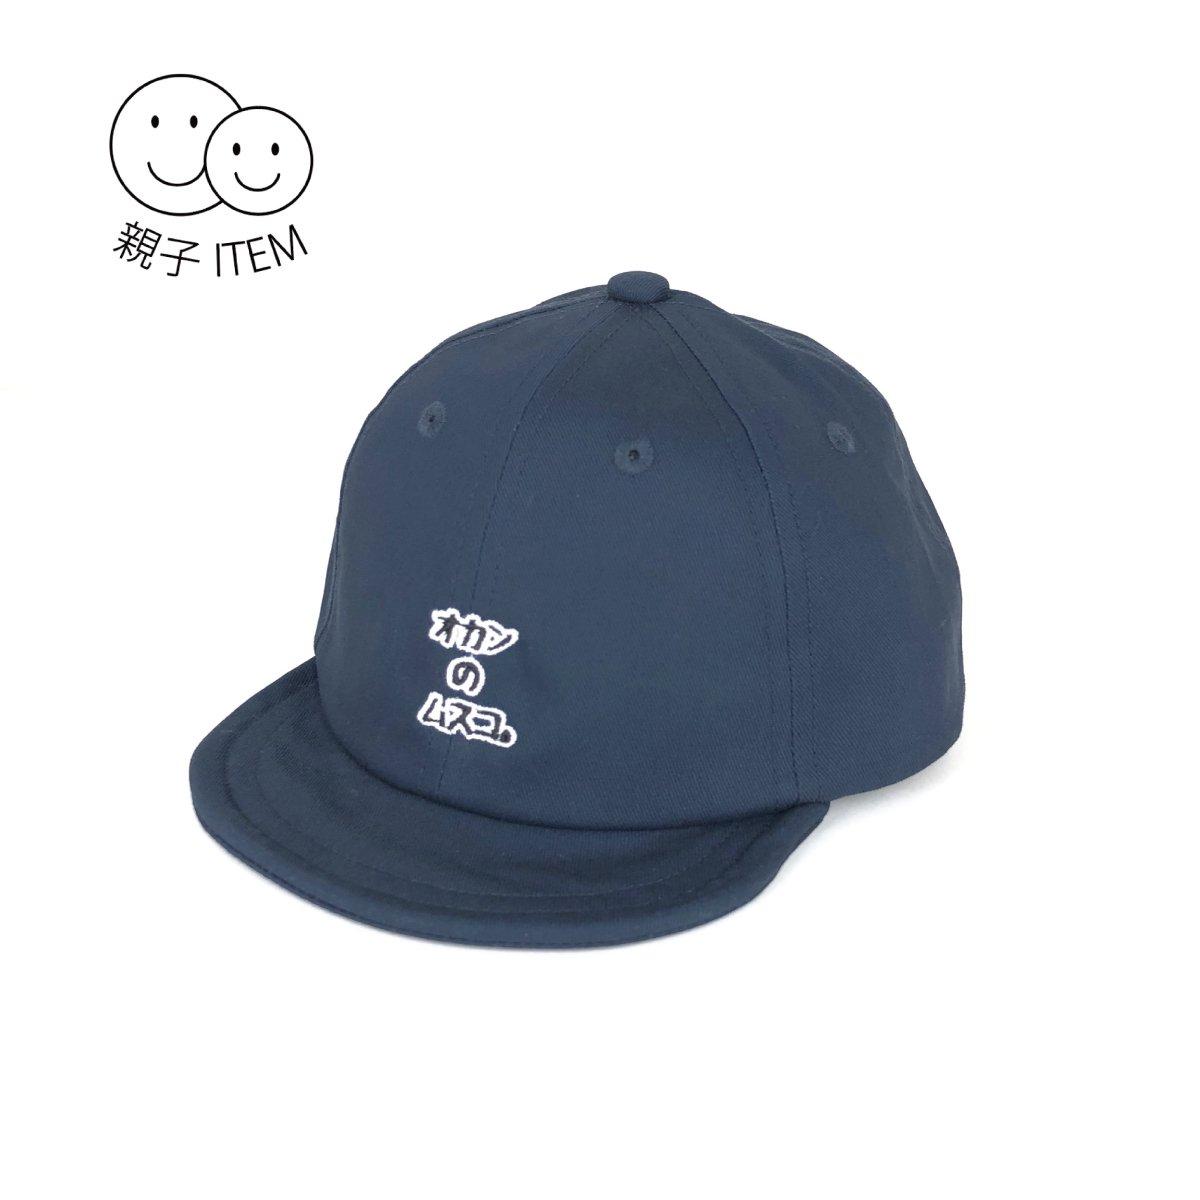 O2M2 Kids Shisyu Cap 詳細画像1